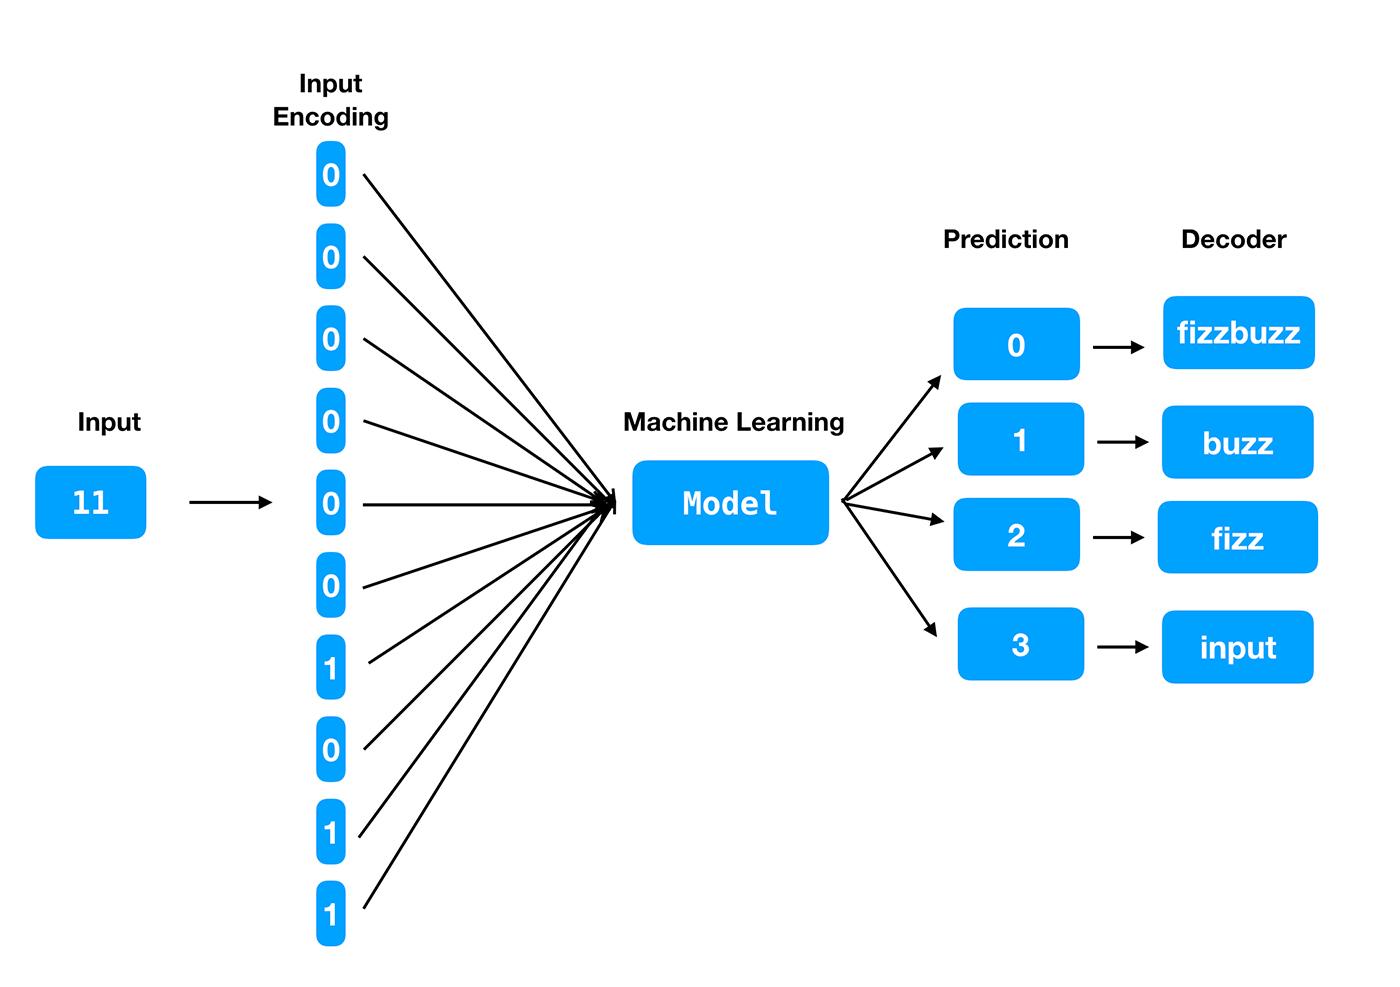 Data encoding/decoding architecture